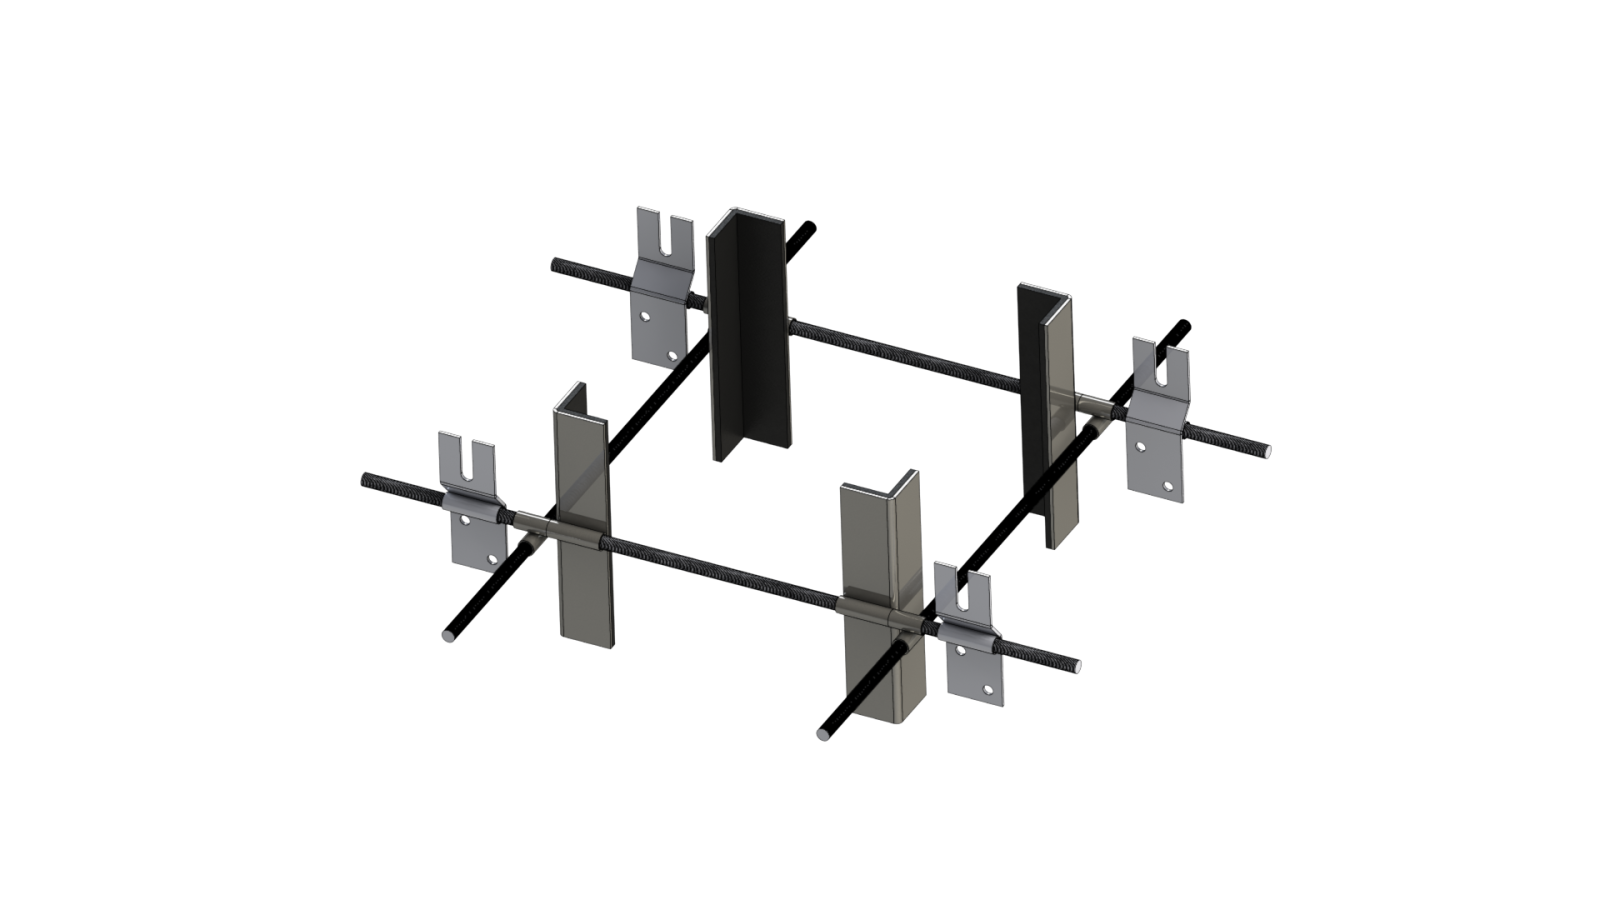 sparrenhalter universal leichtbaukamin rauchfang fachhandel. Black Bedroom Furniture Sets. Home Design Ideas